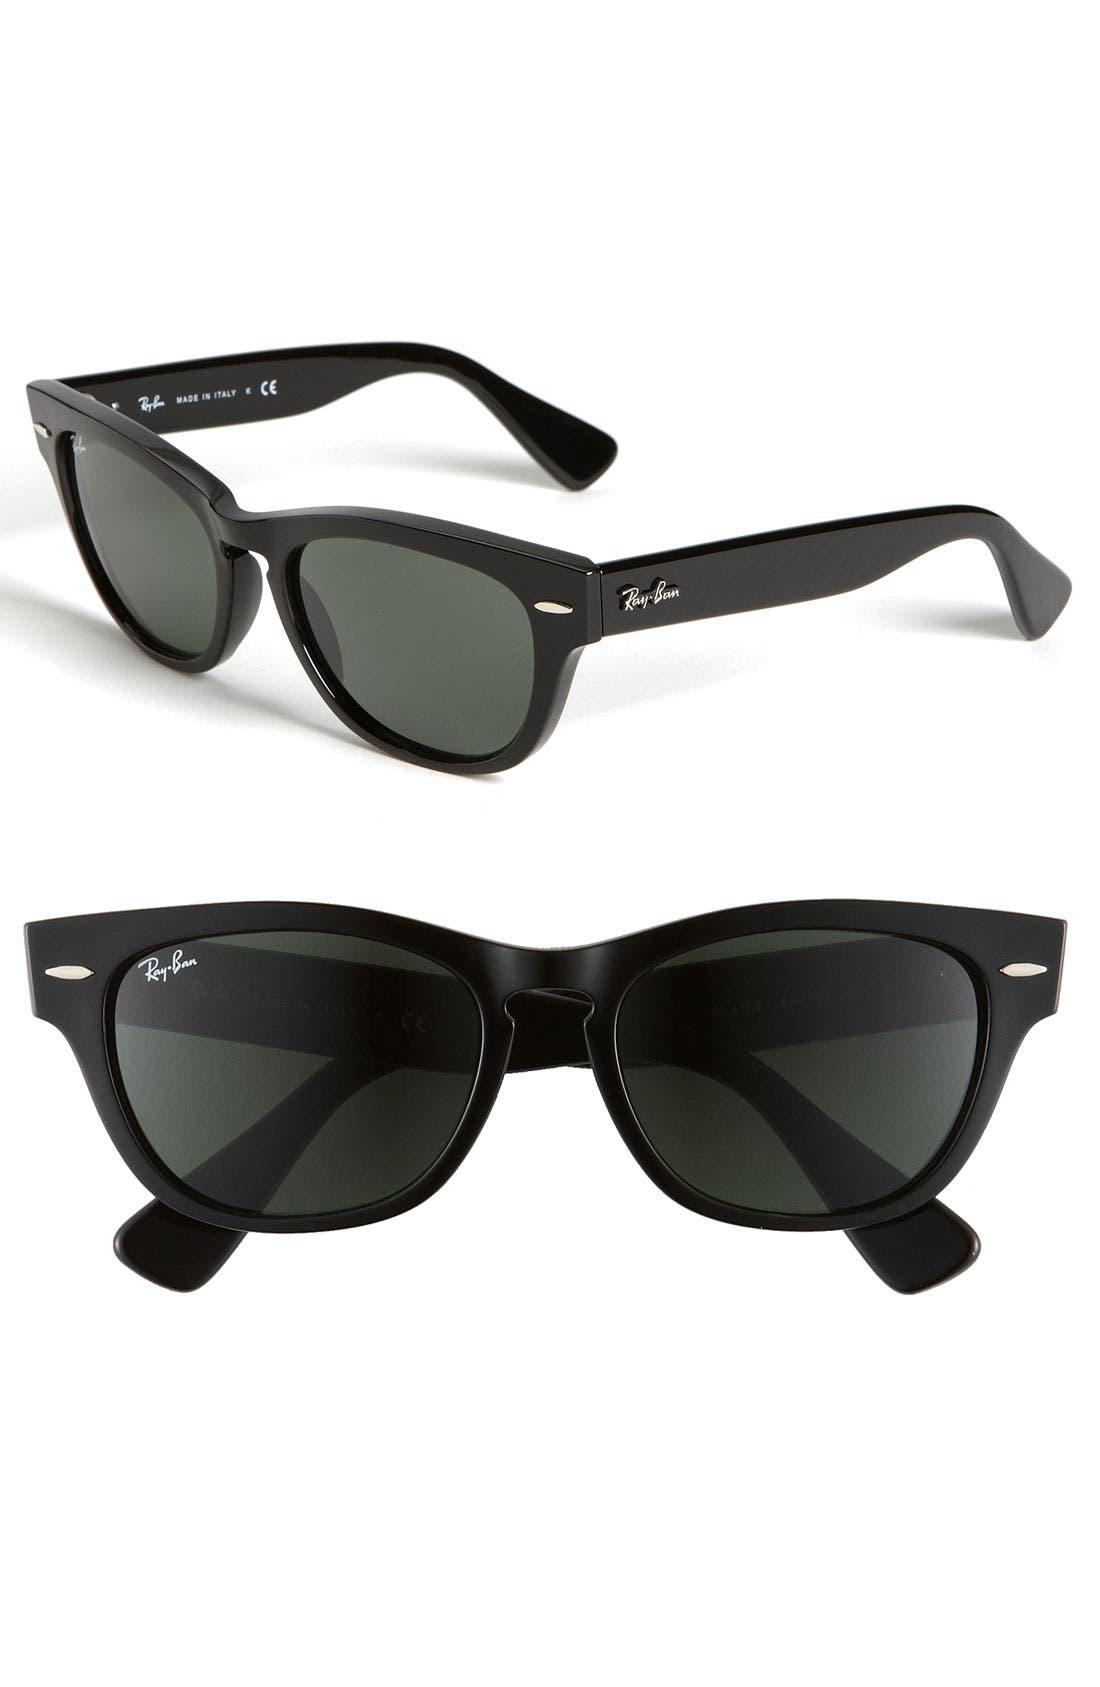 Main Image - Ray-Ban 'Legend Collection Wayfarer' Sunglasses